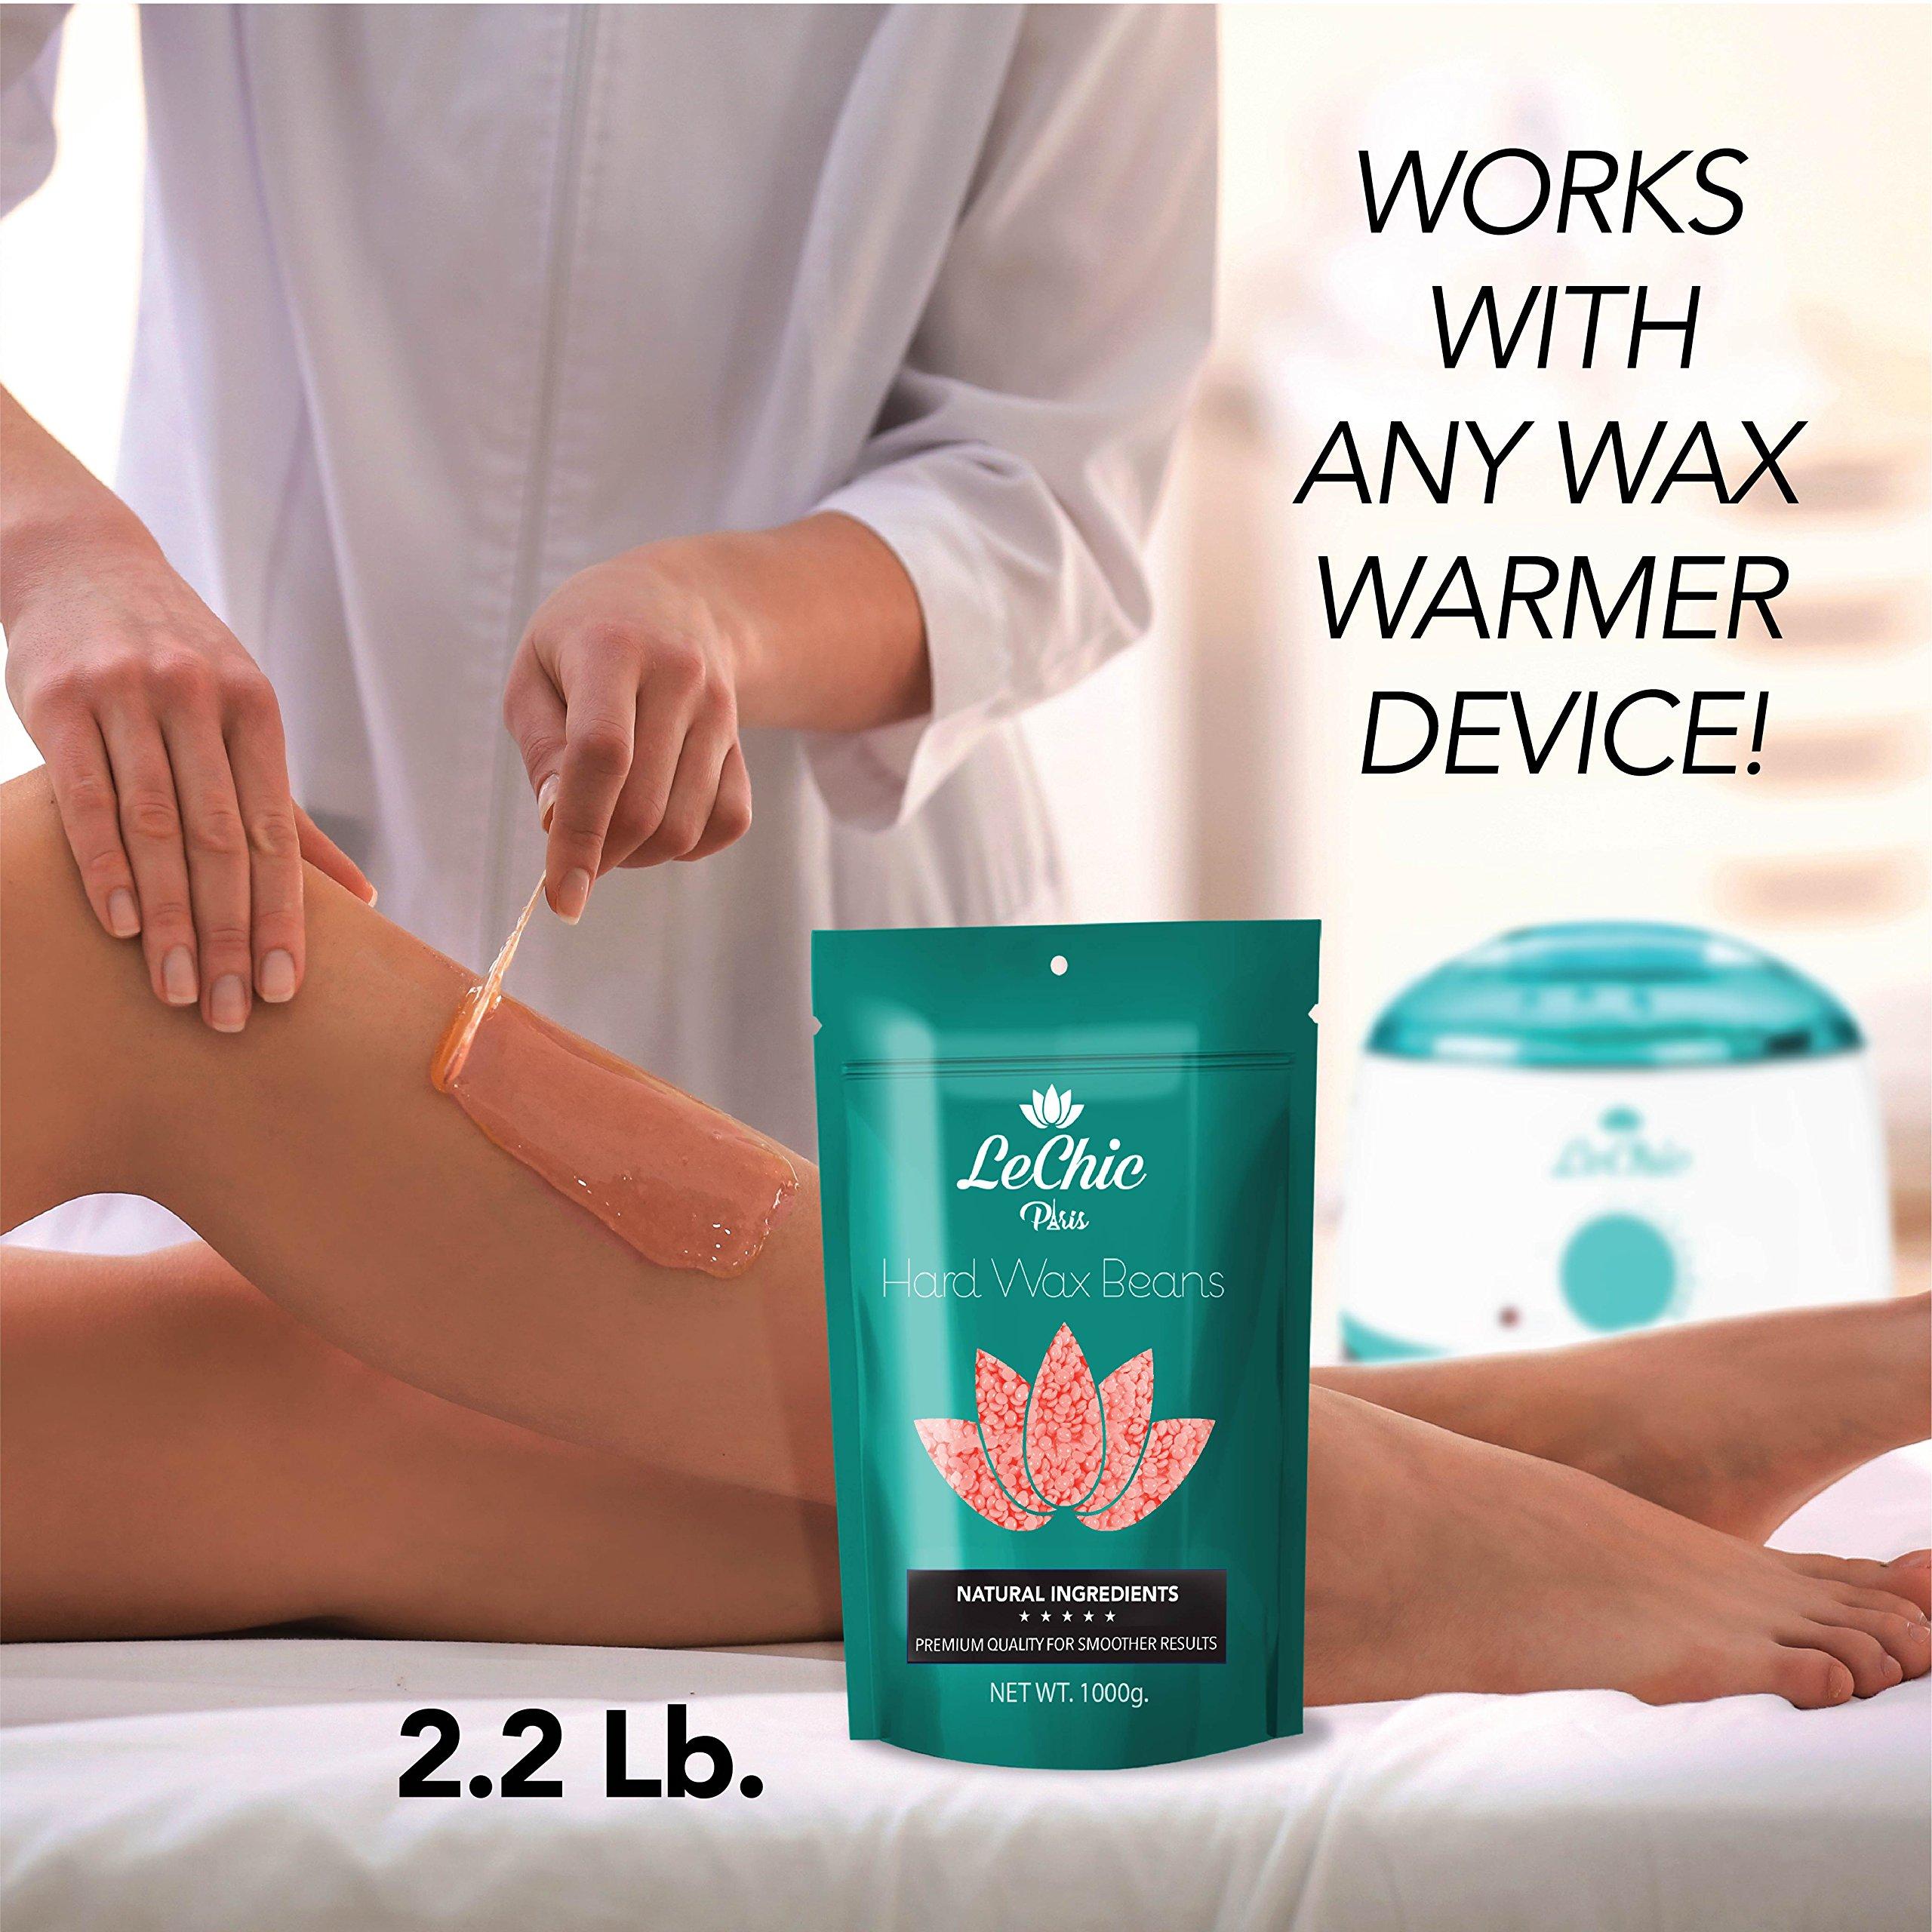 Wax Beans - Hard Wax Beans for Hair Removal - Brazilian Bikini Waxing - Pearl Wax - MEGA REFILL 35 oz. bag (2.2 LB) for Sensitive Body Skin by LeChic by LeChic (Image #3)